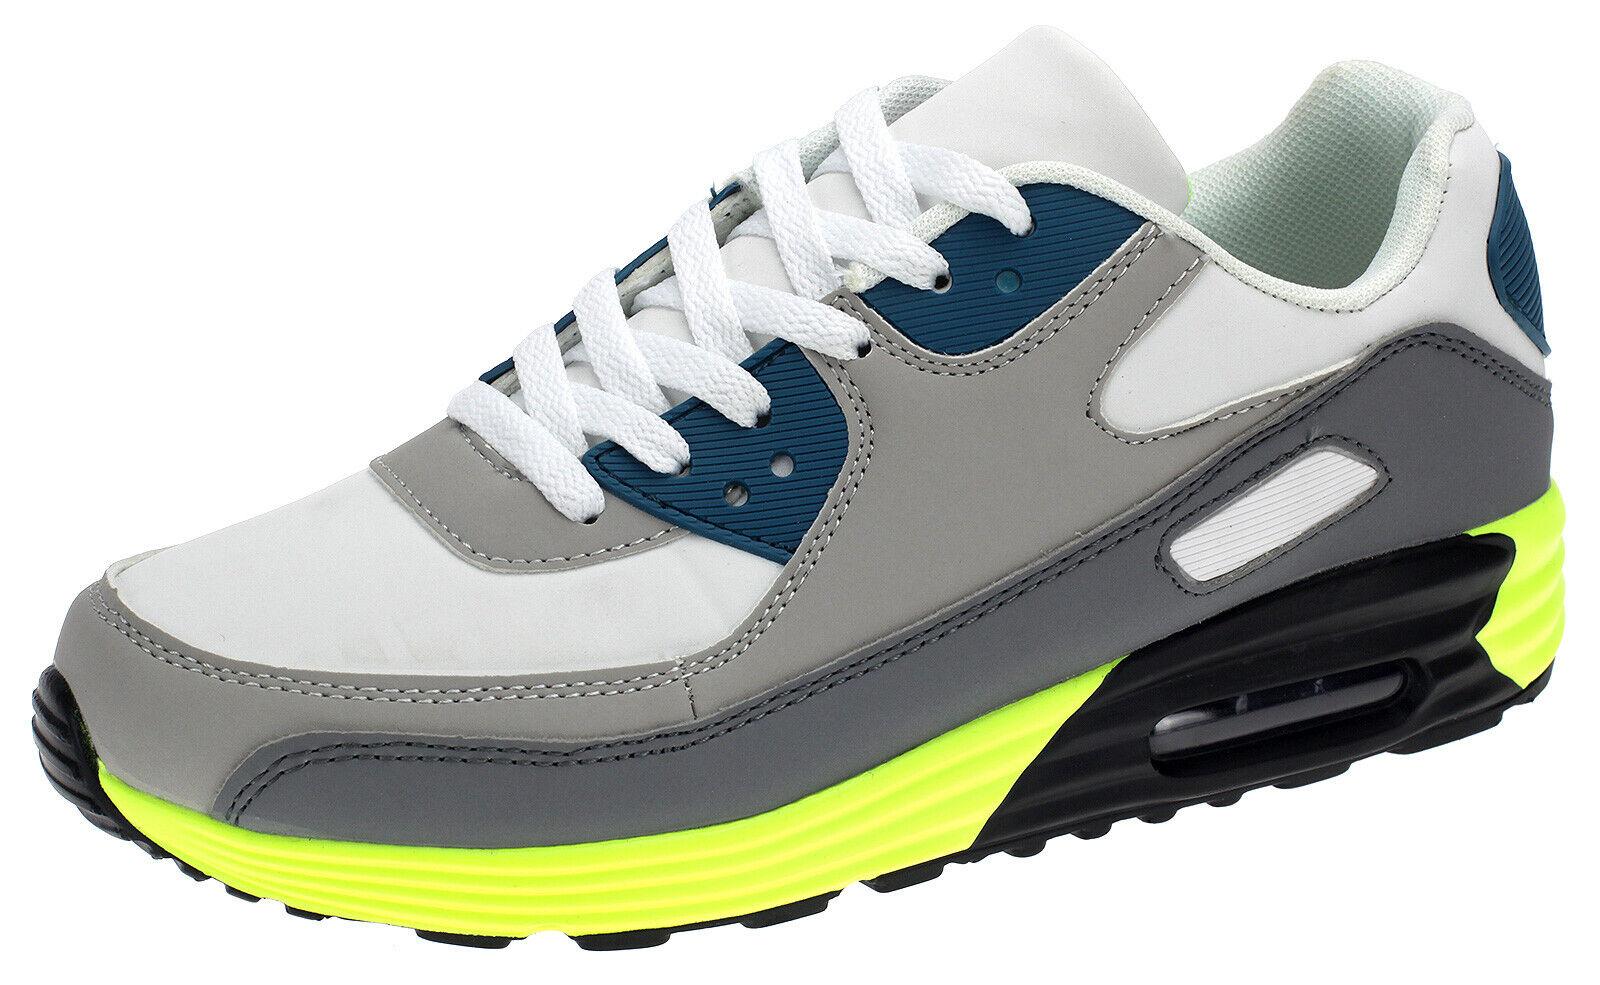 42. weiß-grau-grün